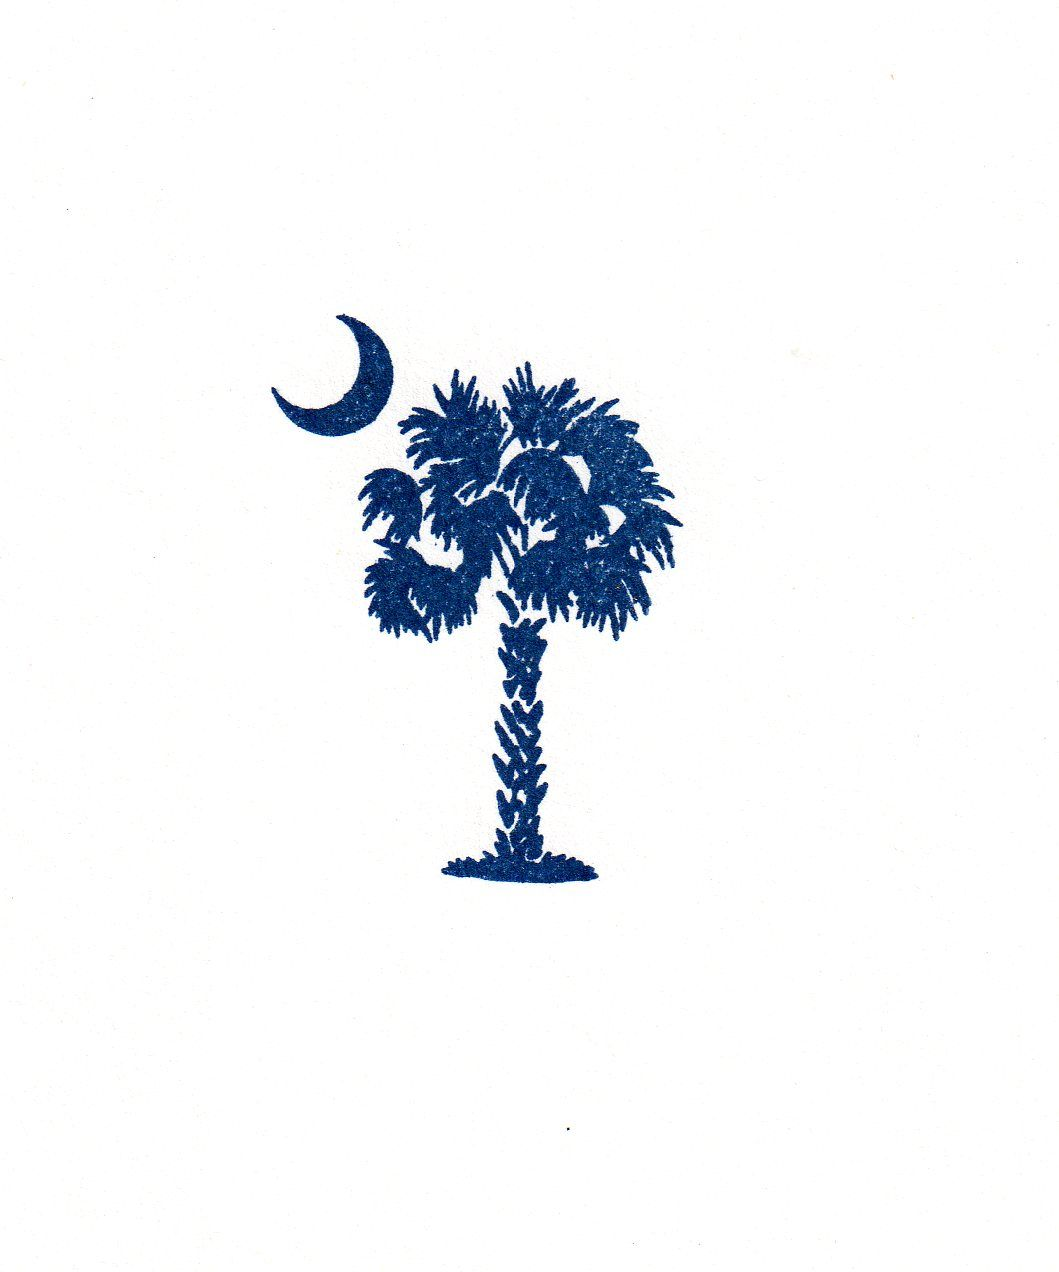 Sc Flag Tattoos: South Carolina Tattoo, Palmetto Tree